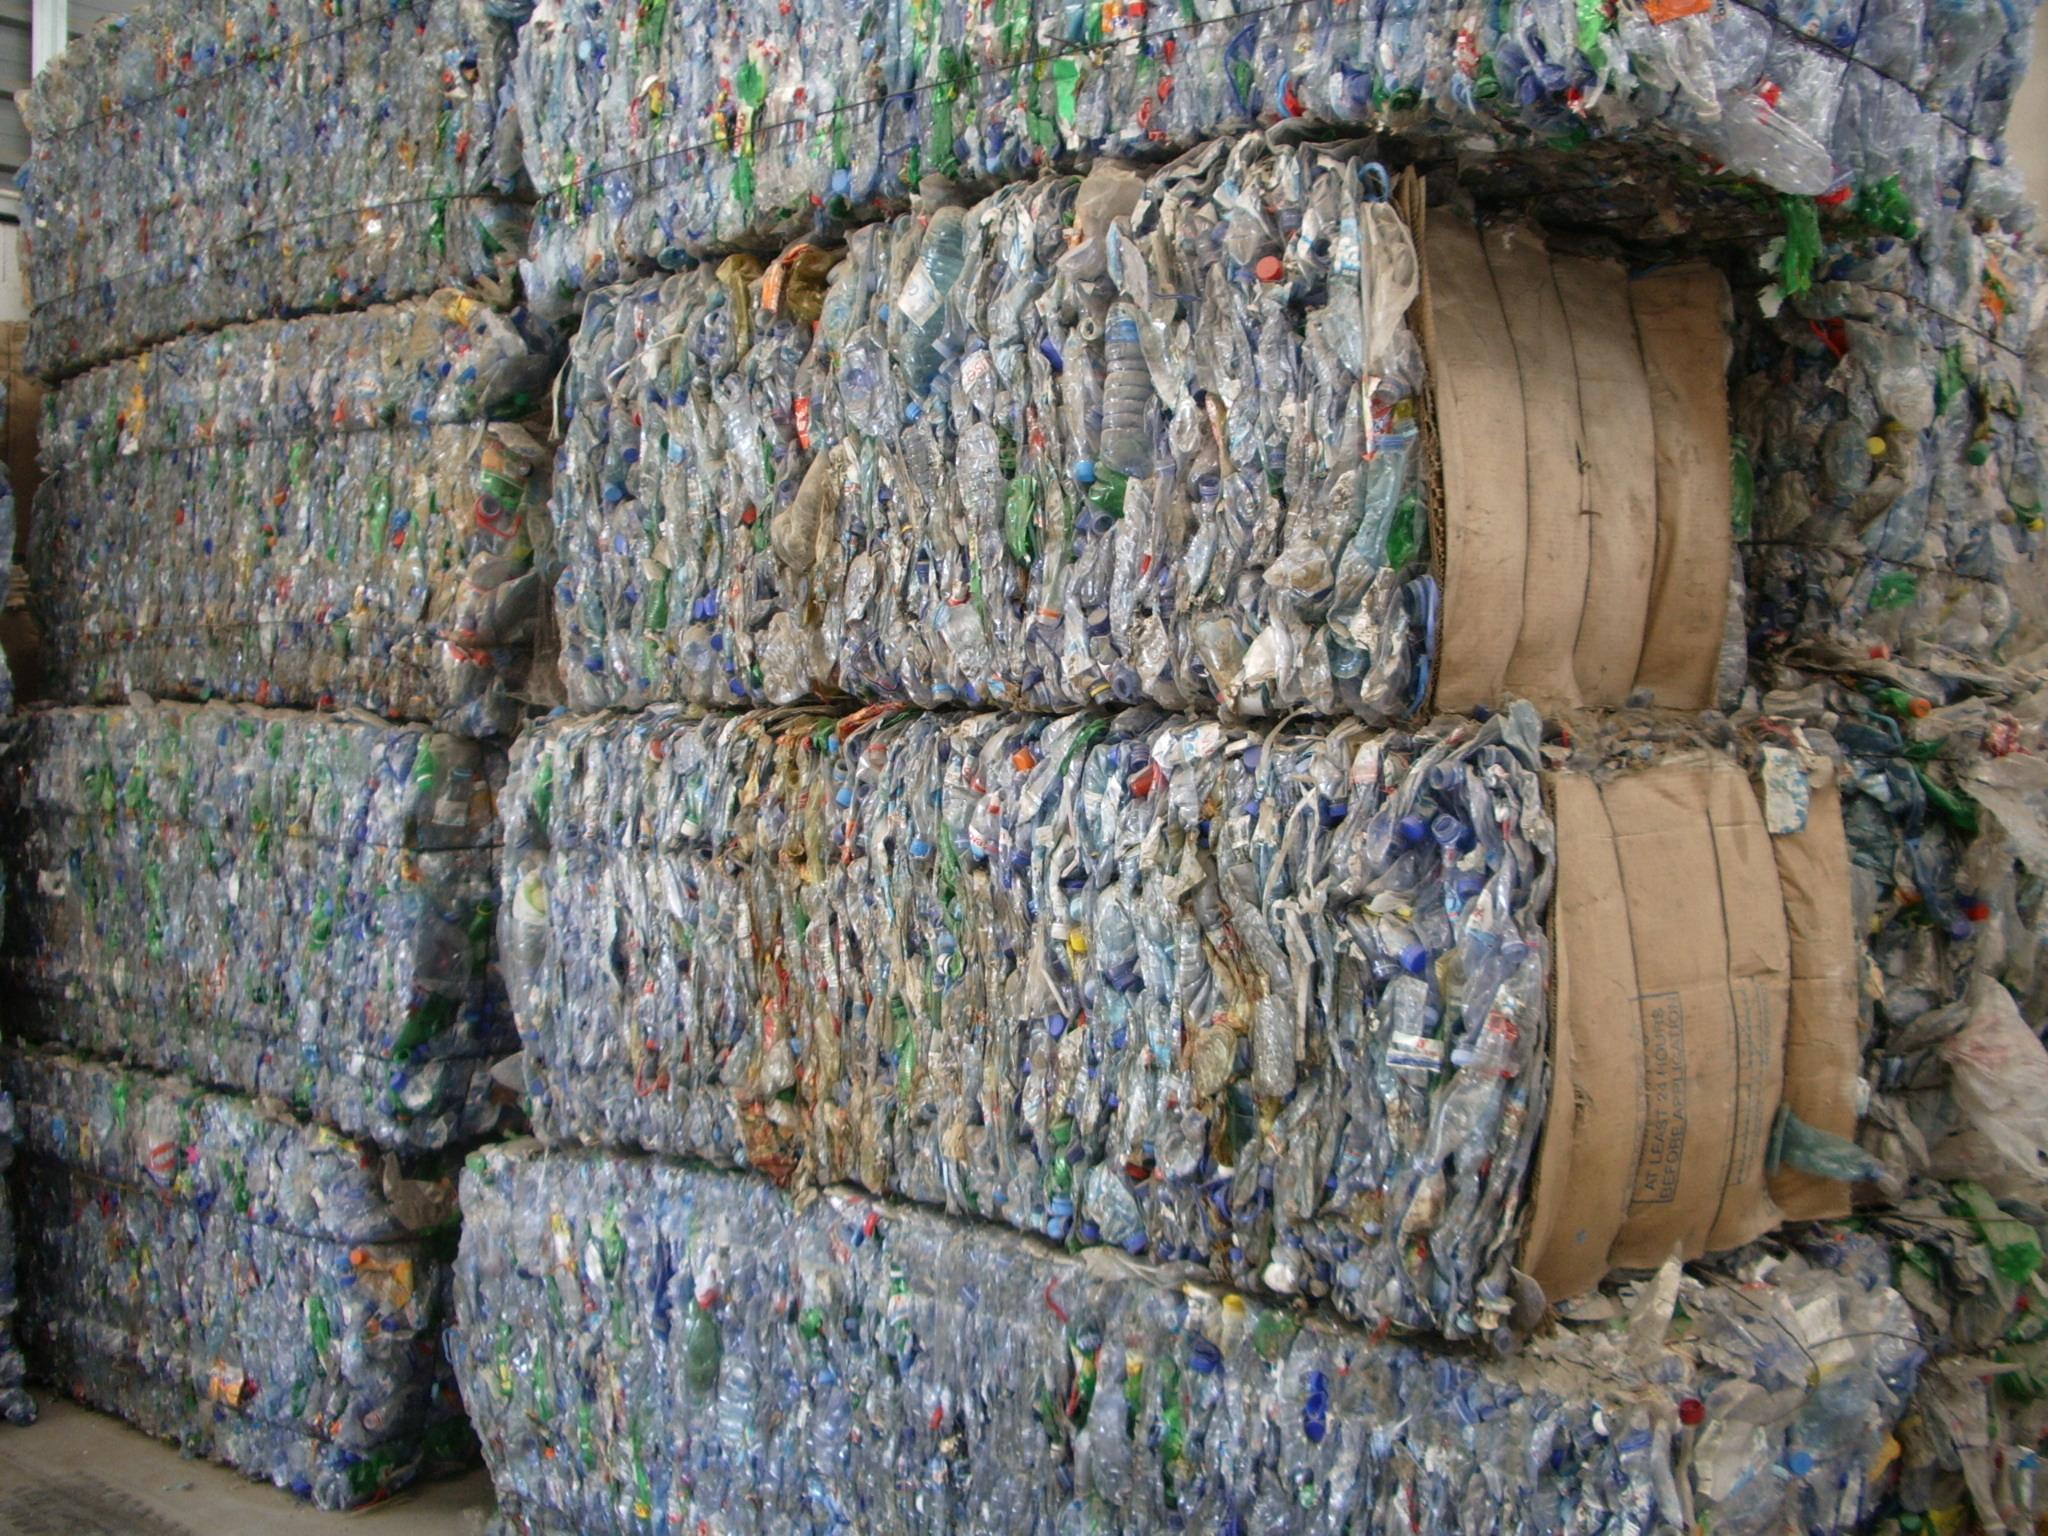 Atlana公司于2001在中东成立,依靠其在回收塑料清洗加工领域的领先经验和优势并最早与欧,非洲建立完善供应销售网络,以此巩固Atlana在埃及回收塑料行业中风行标,成为中东发展最快的回收塑料厂家之一,长期为中国大陆的化纤塑料橡胶厂家提供各类回收PET瓶砖,PET瓶片,PET废丝,PET胶头,PET块料,PETX光片,PET打包带,LDPE/DHPE胶粒,LDPE/HDPE薄膜,PVC破碎料,P.